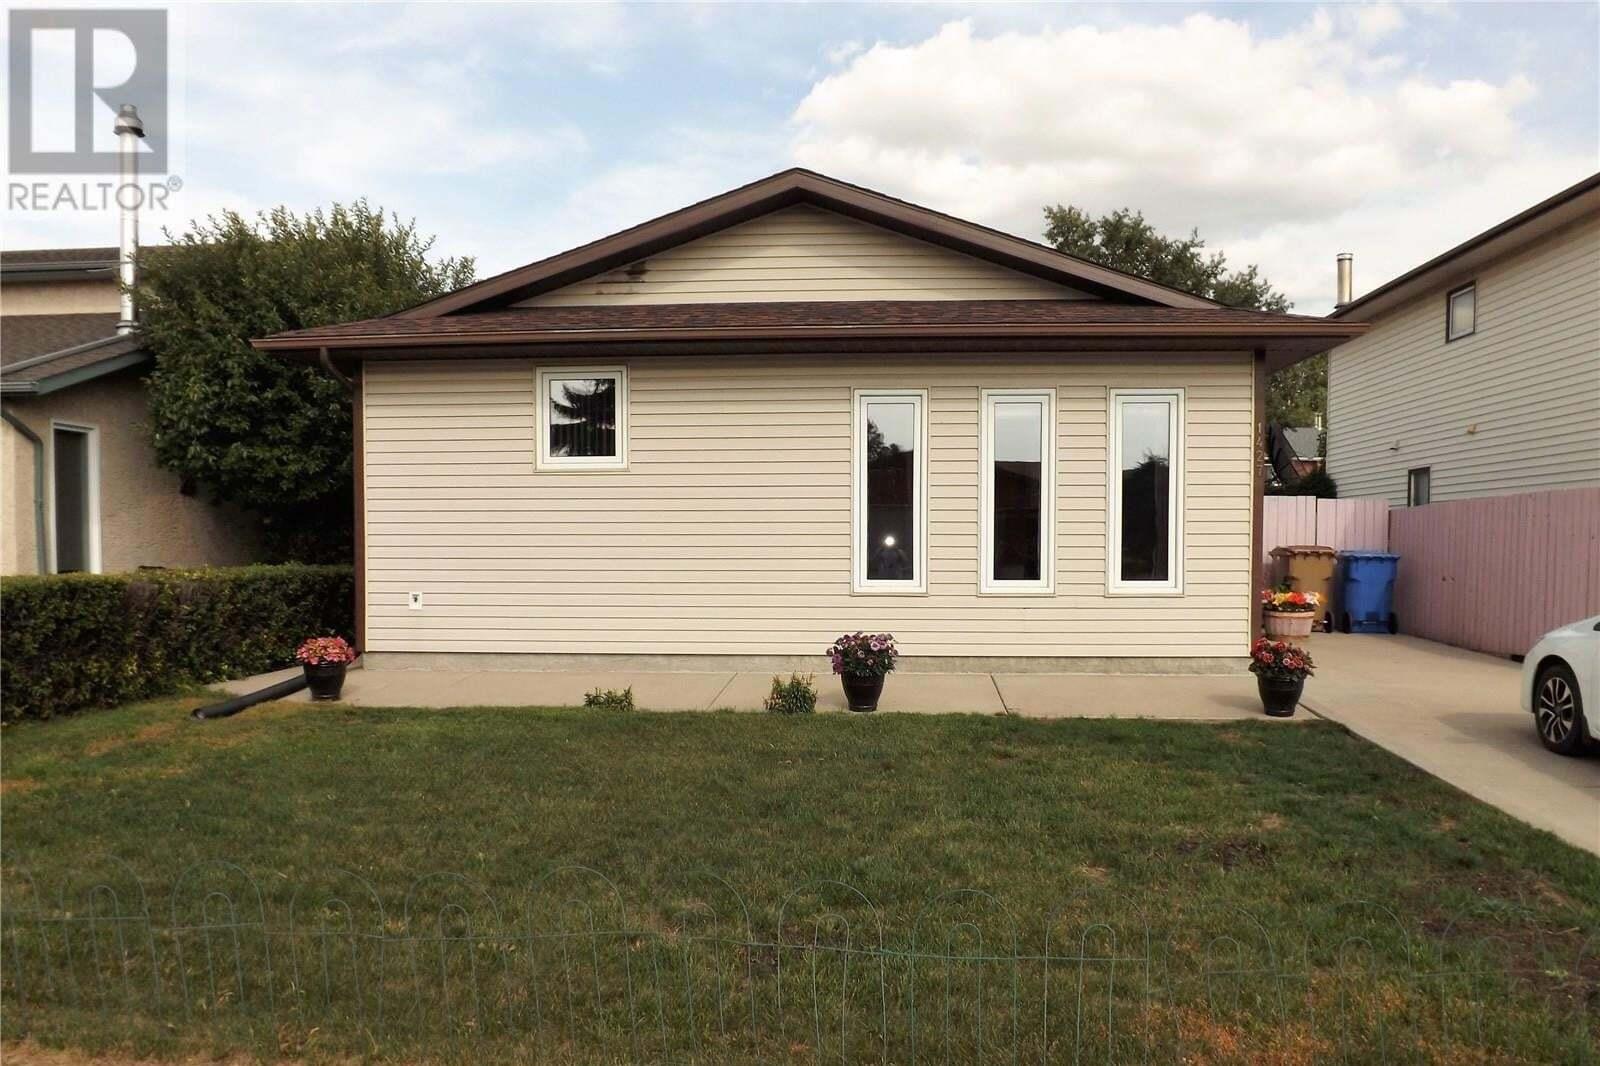 House for sale at 1427 Oxford St Regina Saskatchewan - MLS: SK819492